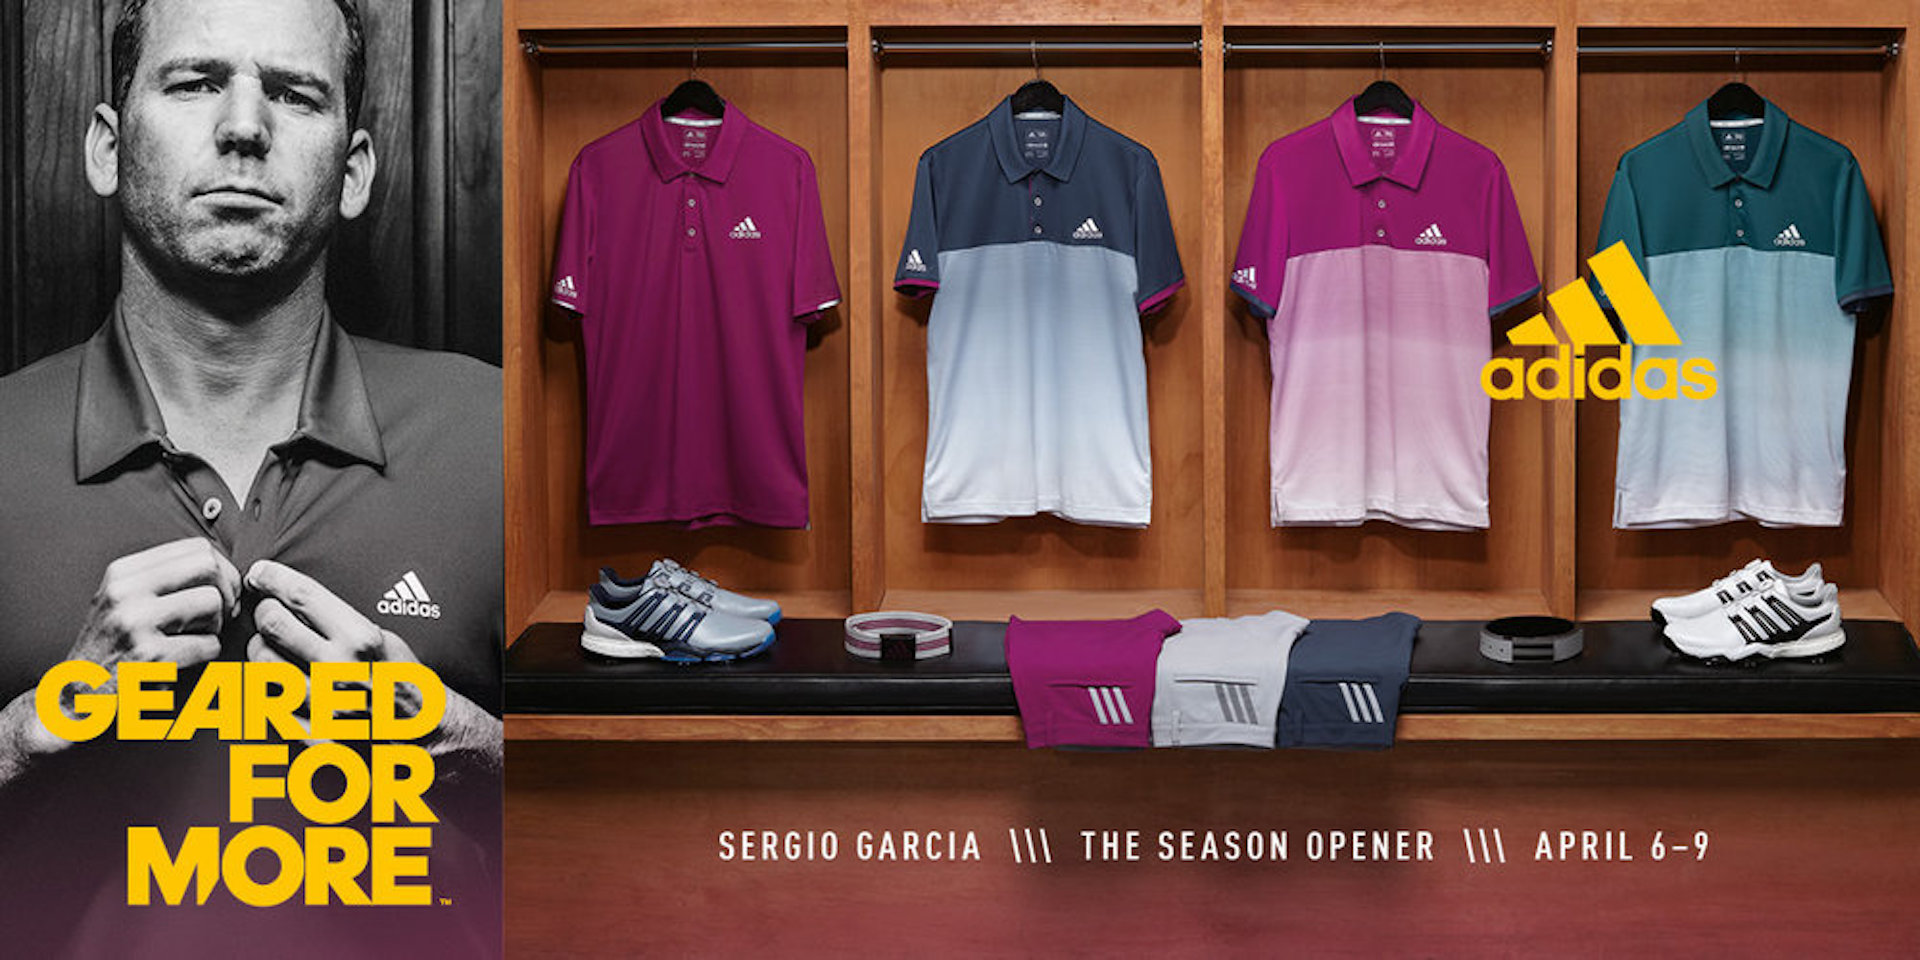 adidas Golf unveils athlete apparel